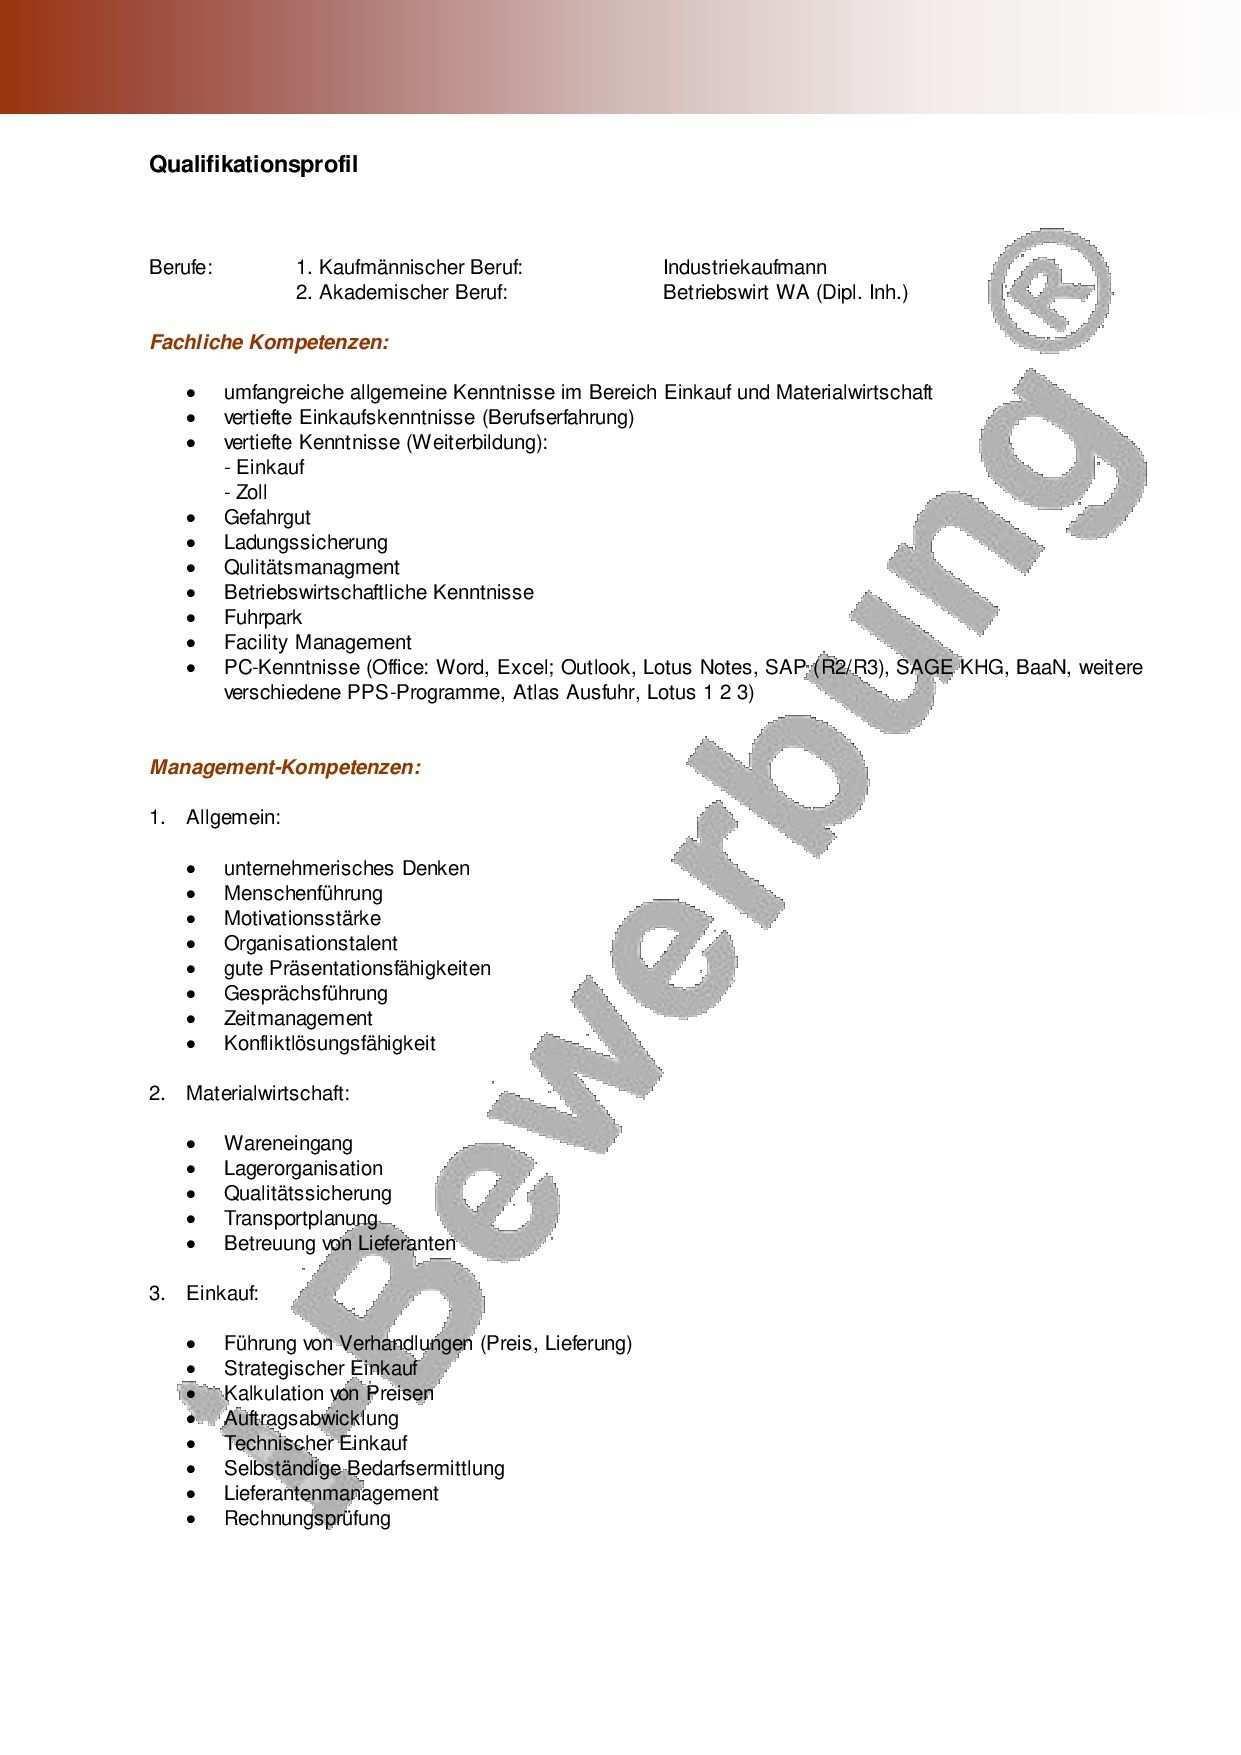 Qualifikationsprofil Zur Initiativbewerbung Vorlage Vorlagen Lebenslauf Bewerbung Lebenslauf